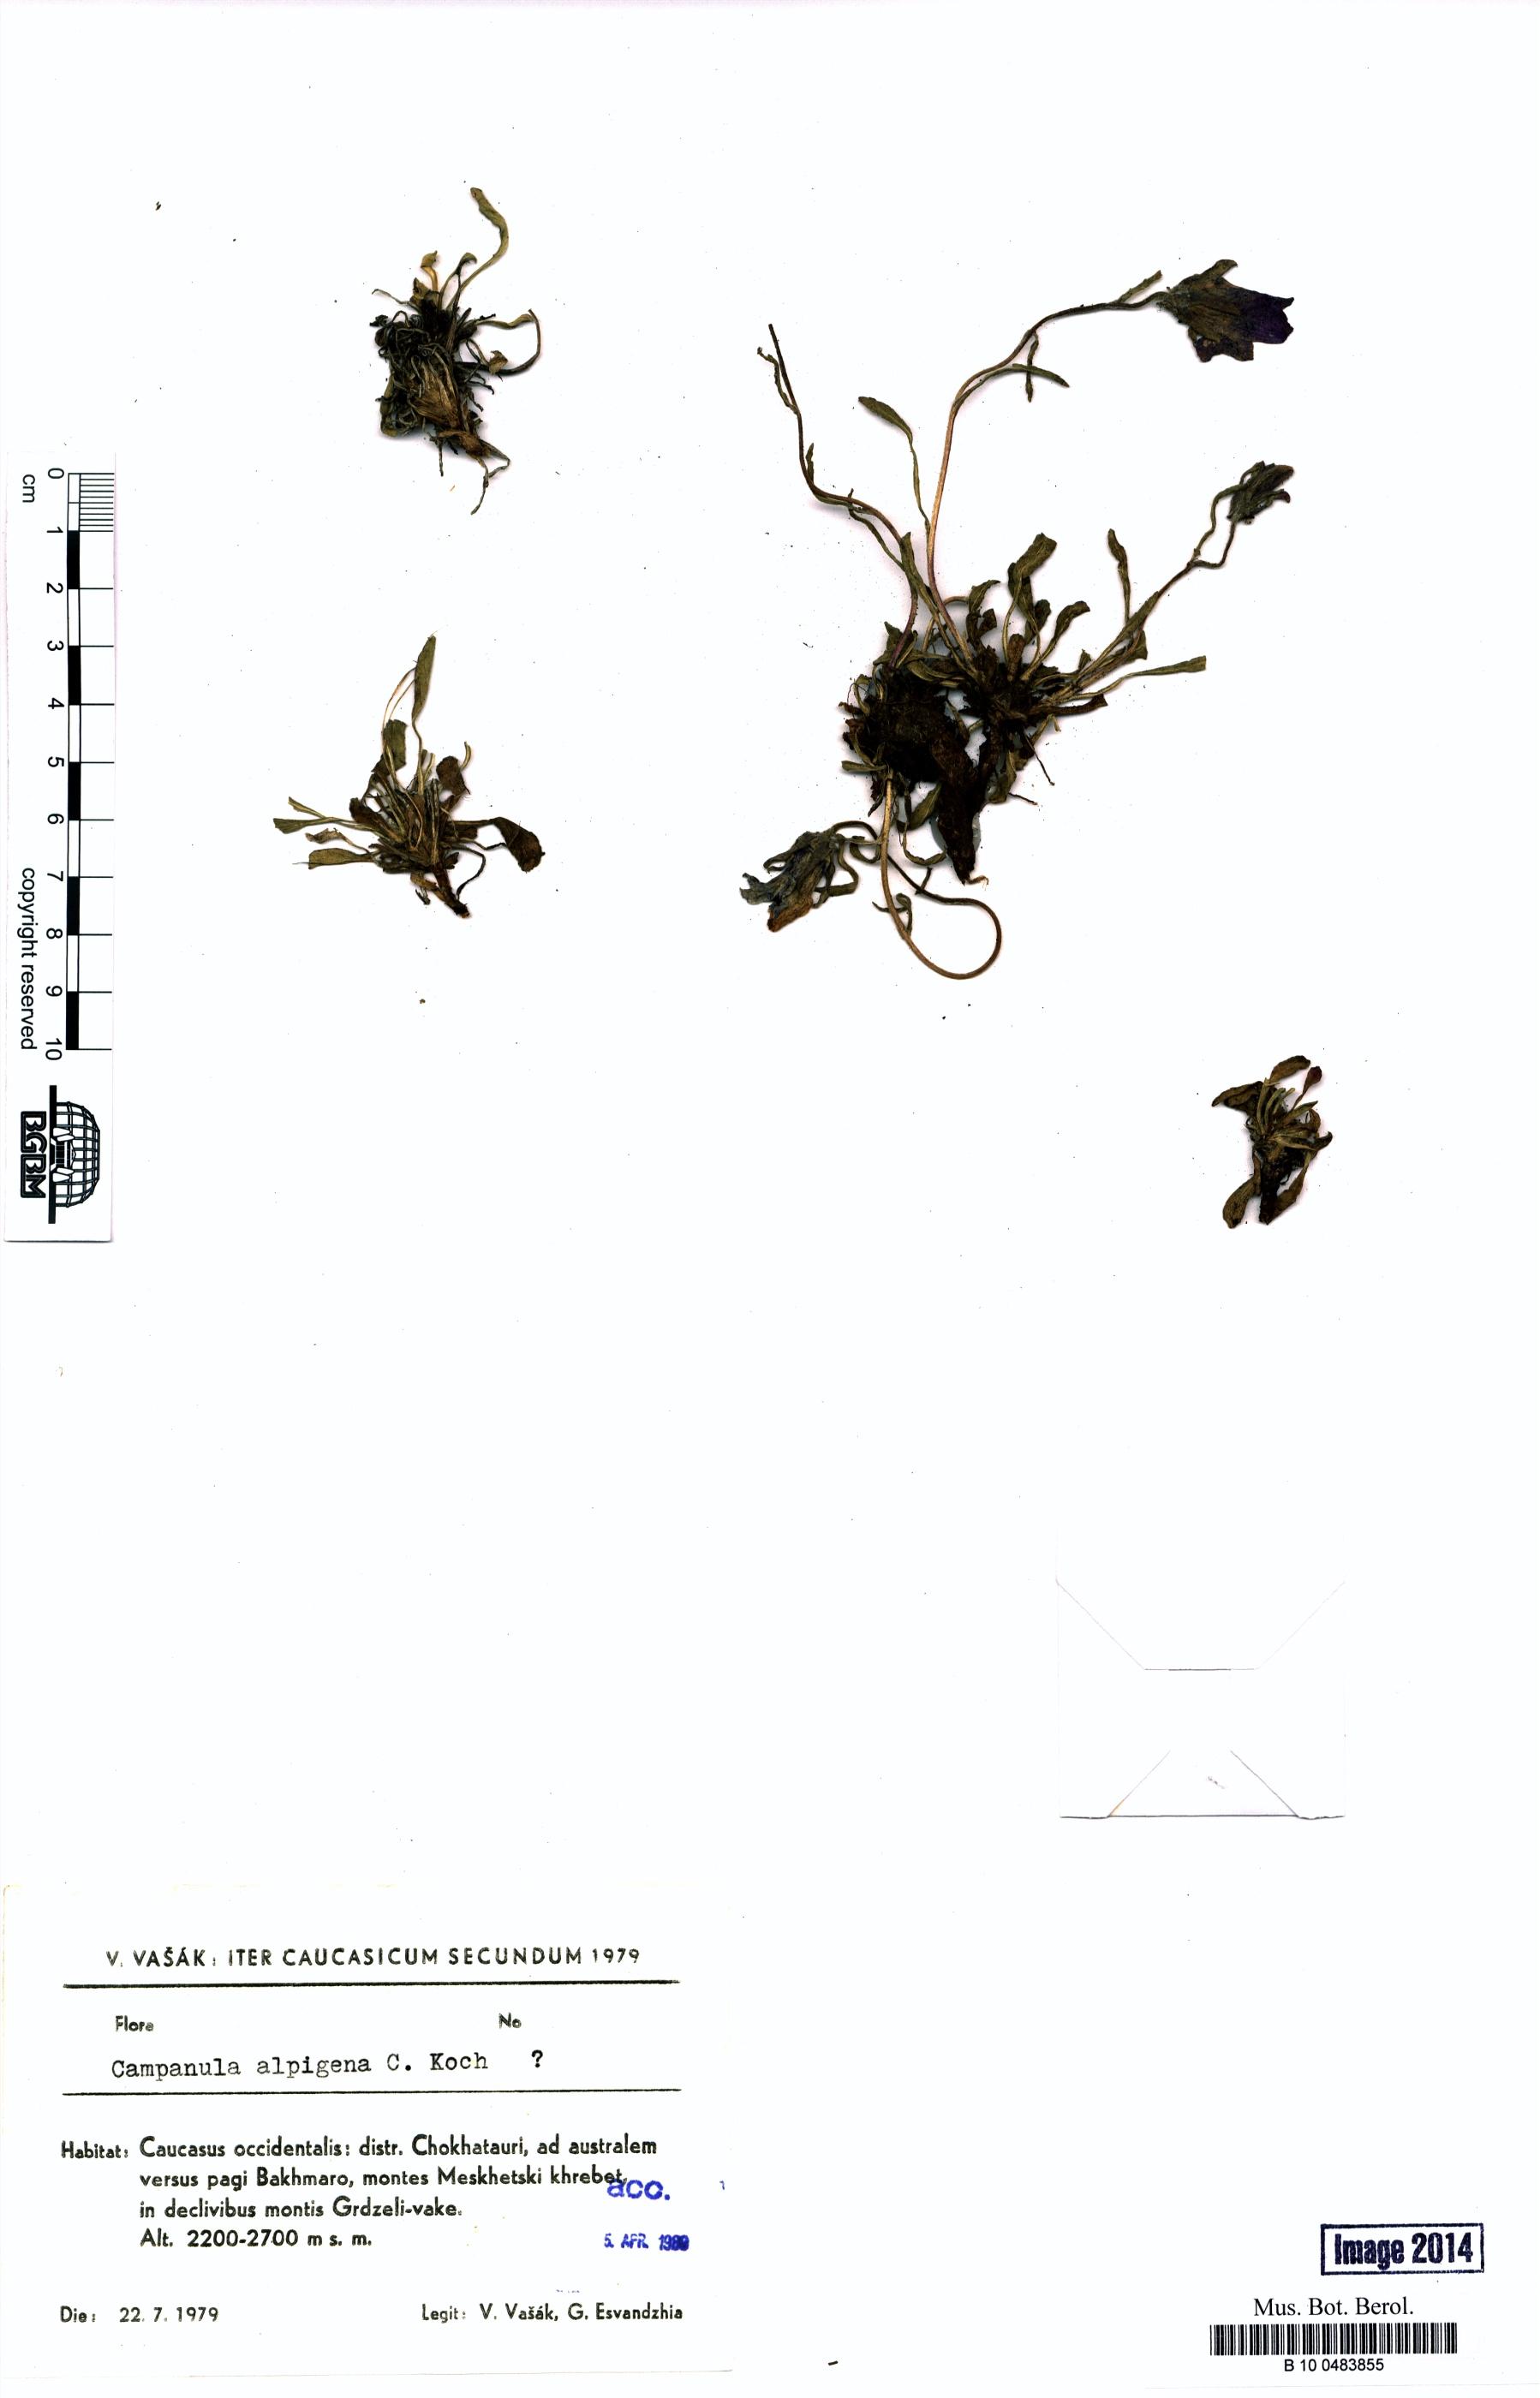 http://ww2.bgbm.org/herbarium/images/B/10/04/83/85/B_10_0483855.jpg